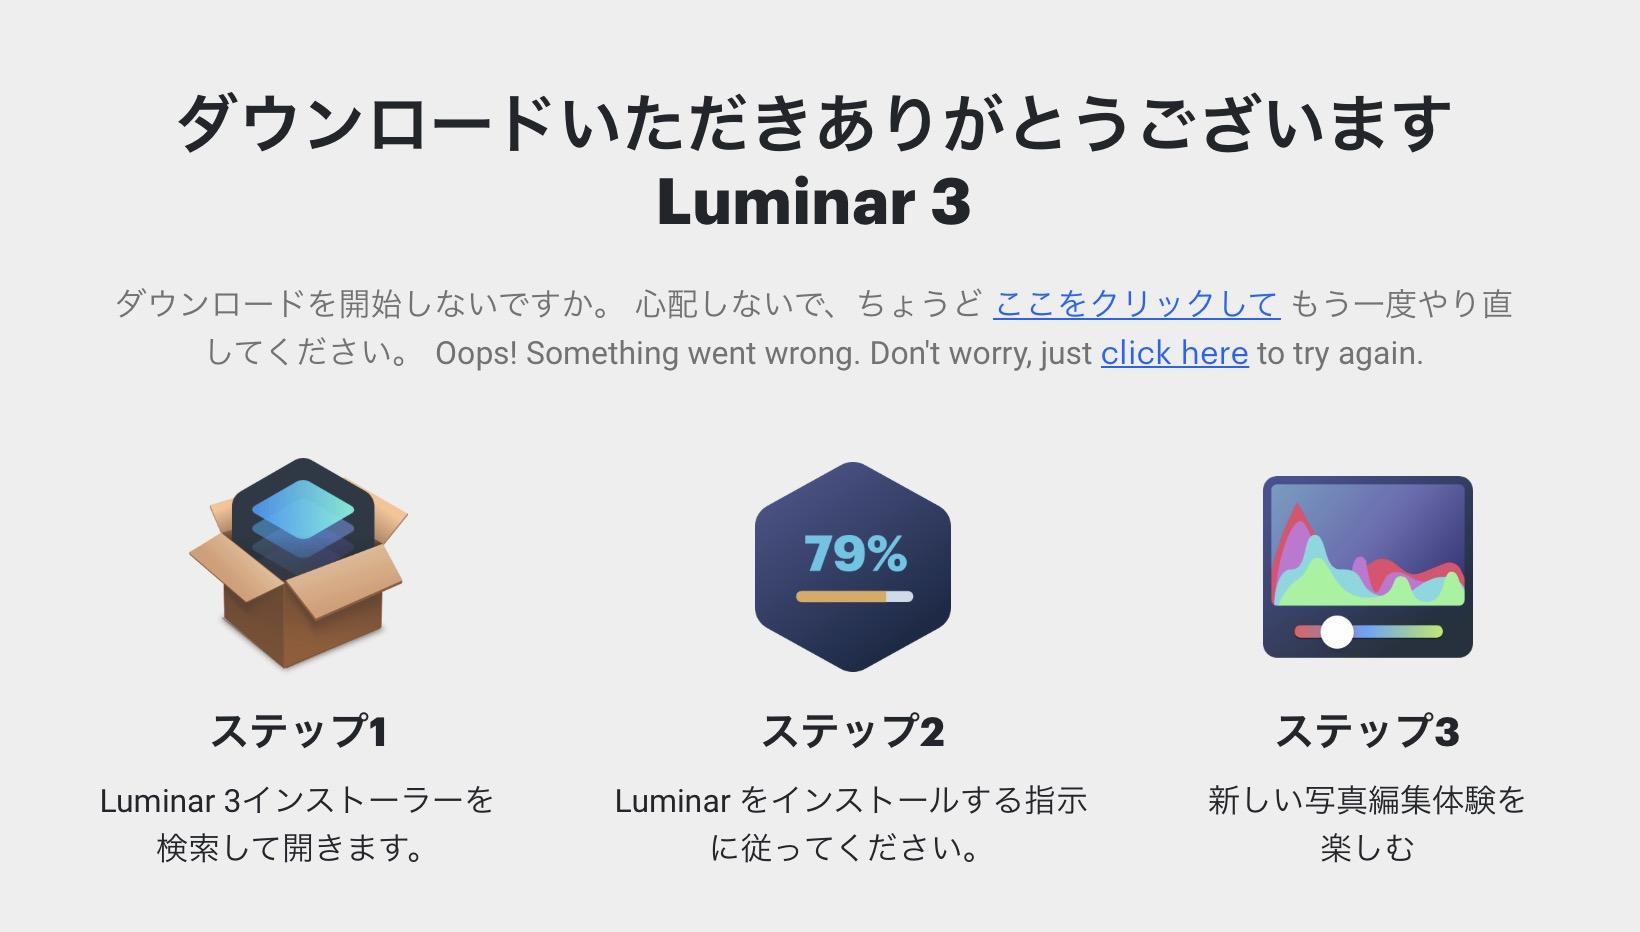 05888c13664c6bed8266e2e076c0b7ad - 当サイトに寄せられたLuminar・Aurora HDRに関する問い合わせ